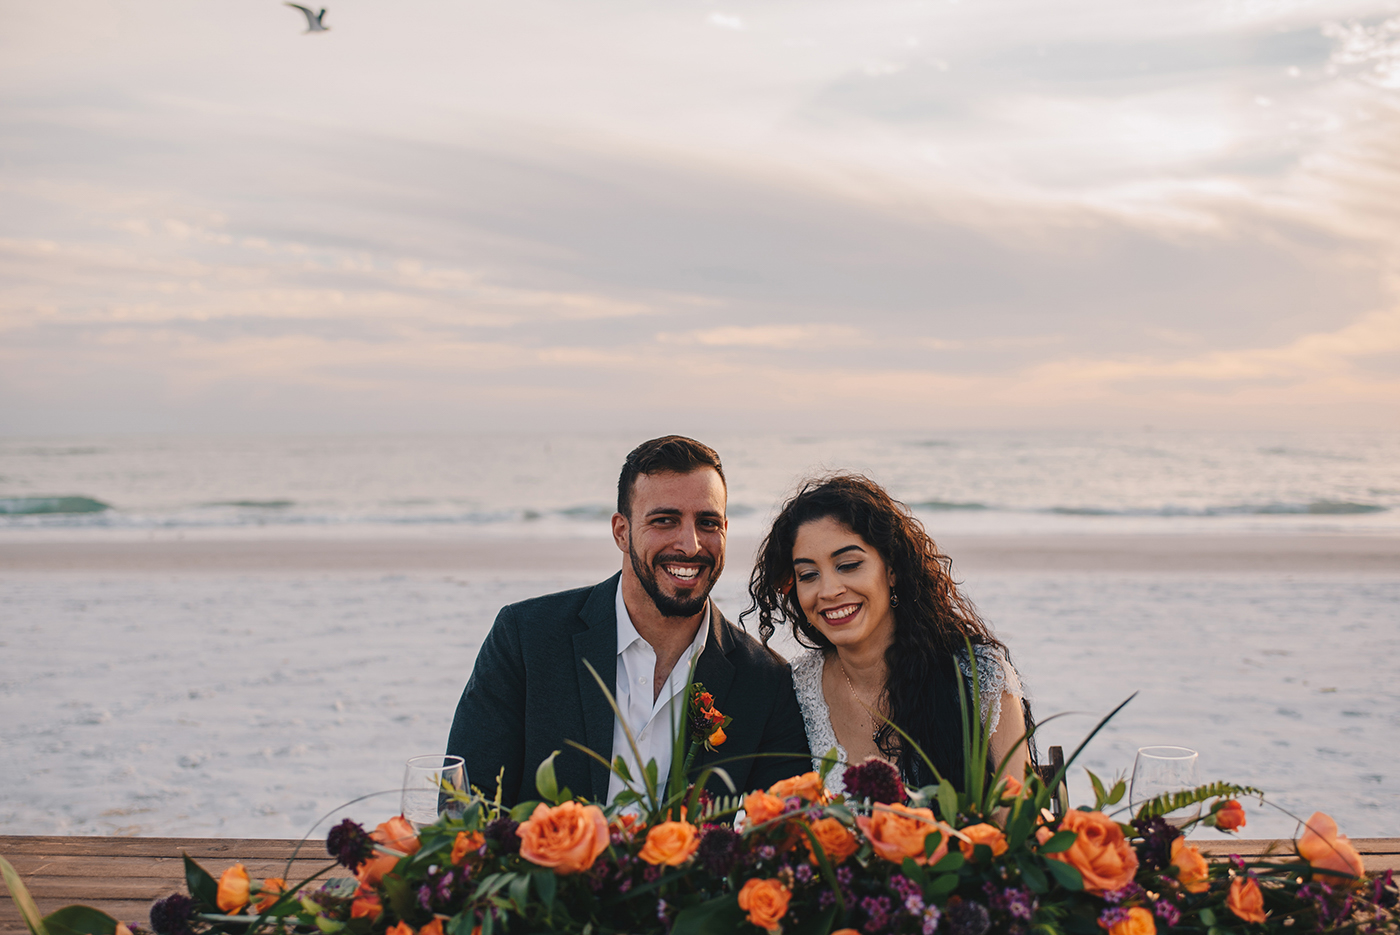 Los-Vargas-Photo-Moana-Wedding-Style-shoot-91.jpg